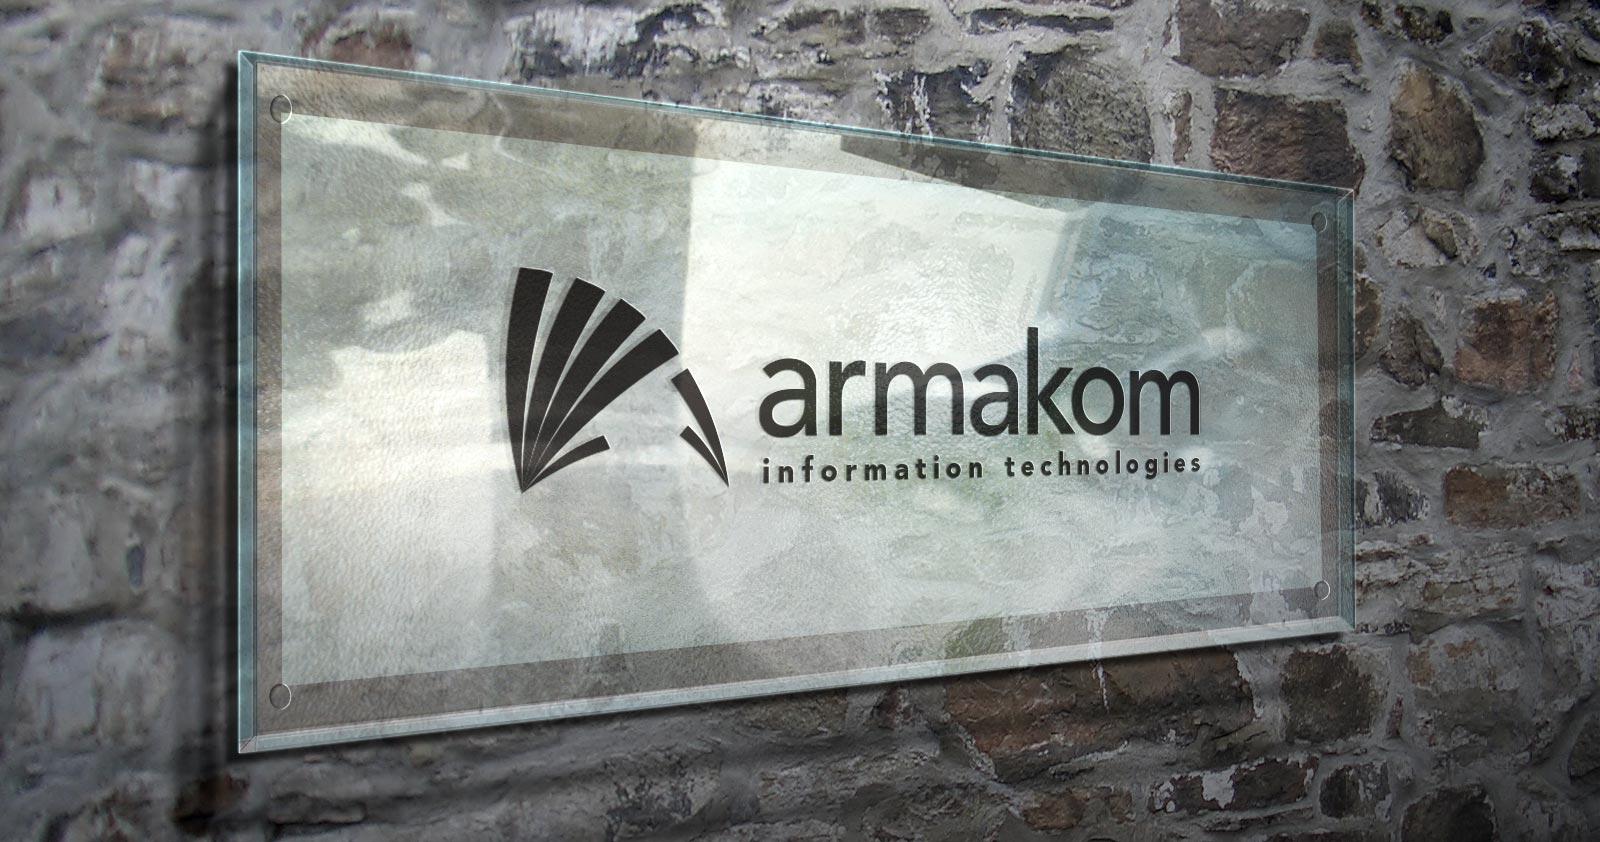 Armakom logo kurumsal kimlik tasarımı 06